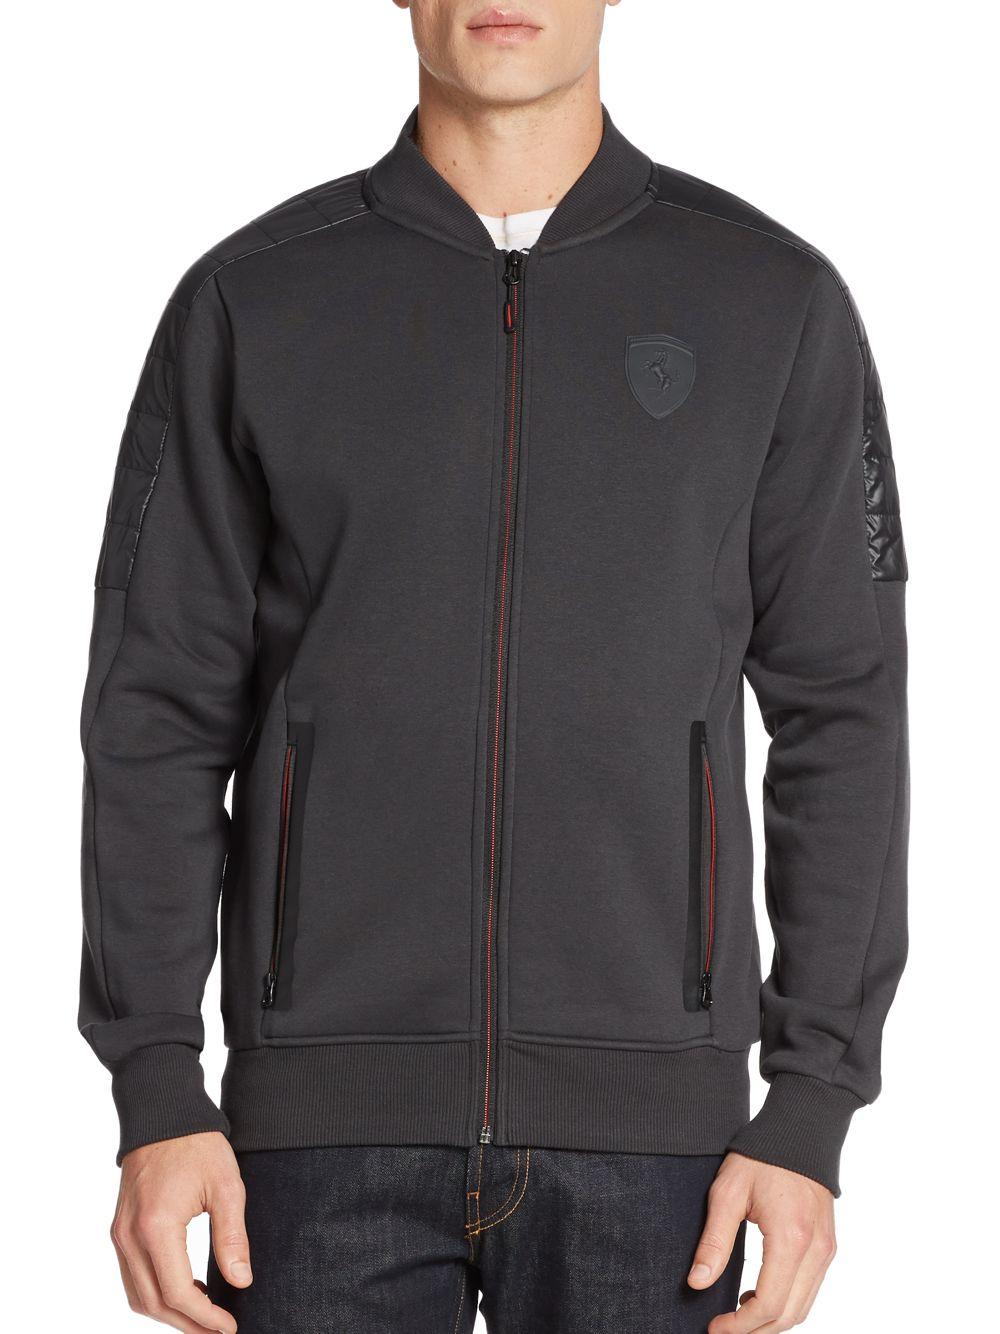 puma ferrari jacket in gray for men | lyst